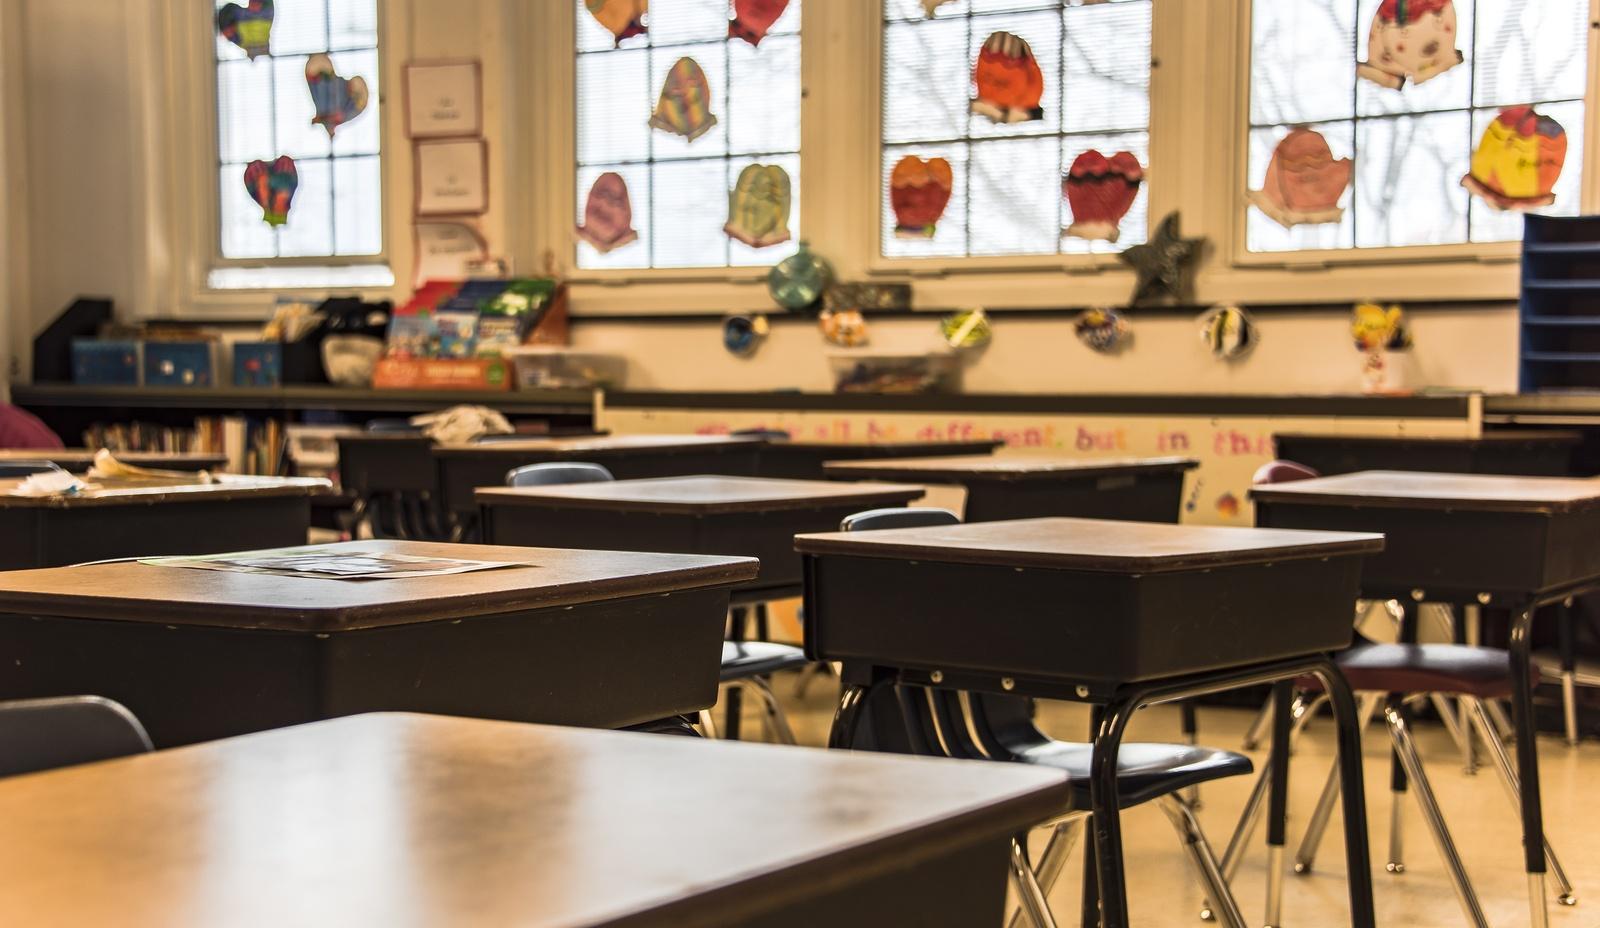 detroit school cleaning, livonia school cleaning, dearborn school cleaning, downriver school cleaning, farmington school cleaning